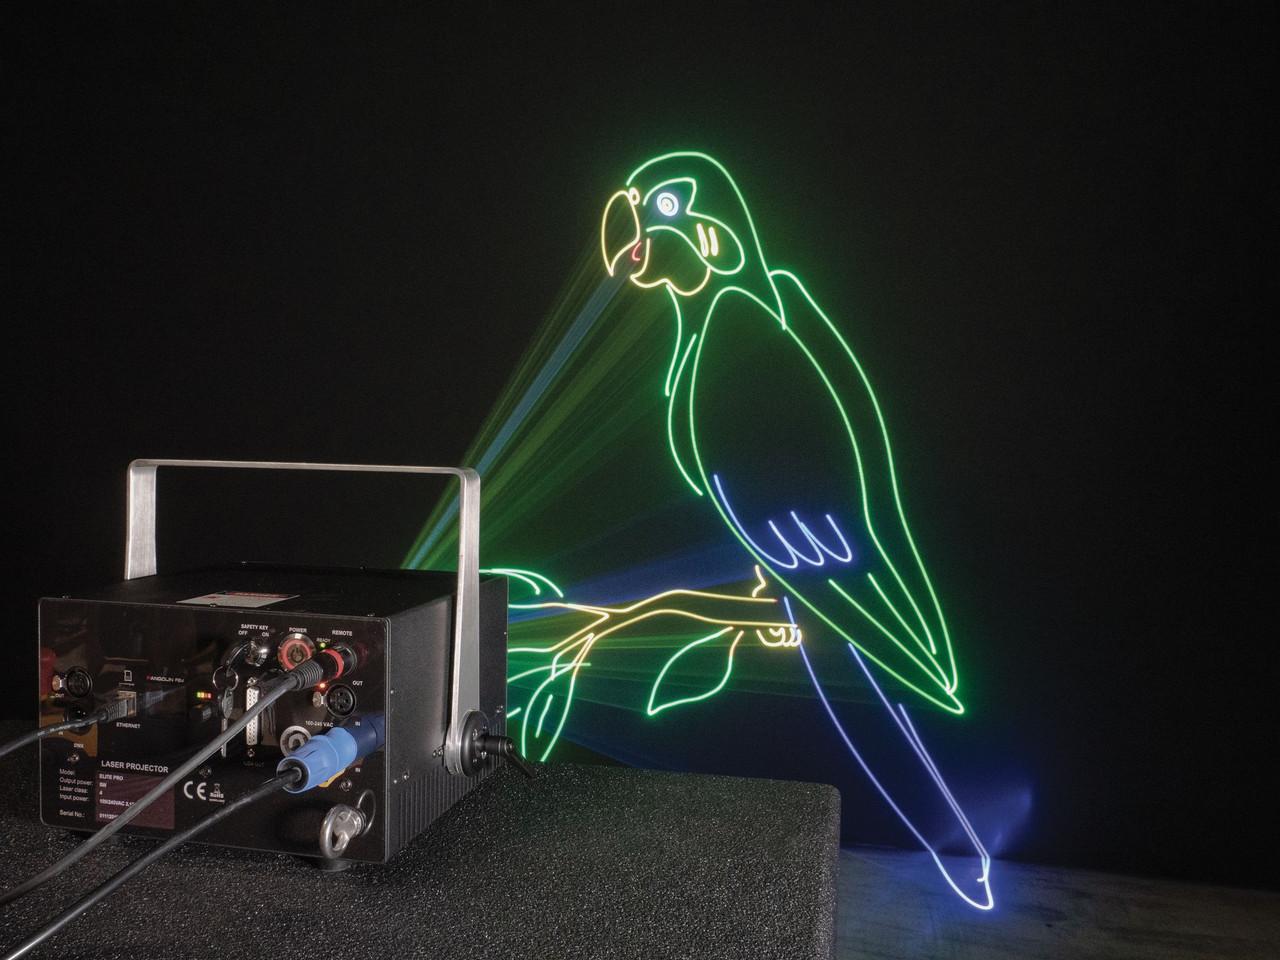 Unity Lasers ELITE 2 ILDA Laser Light Show Projector